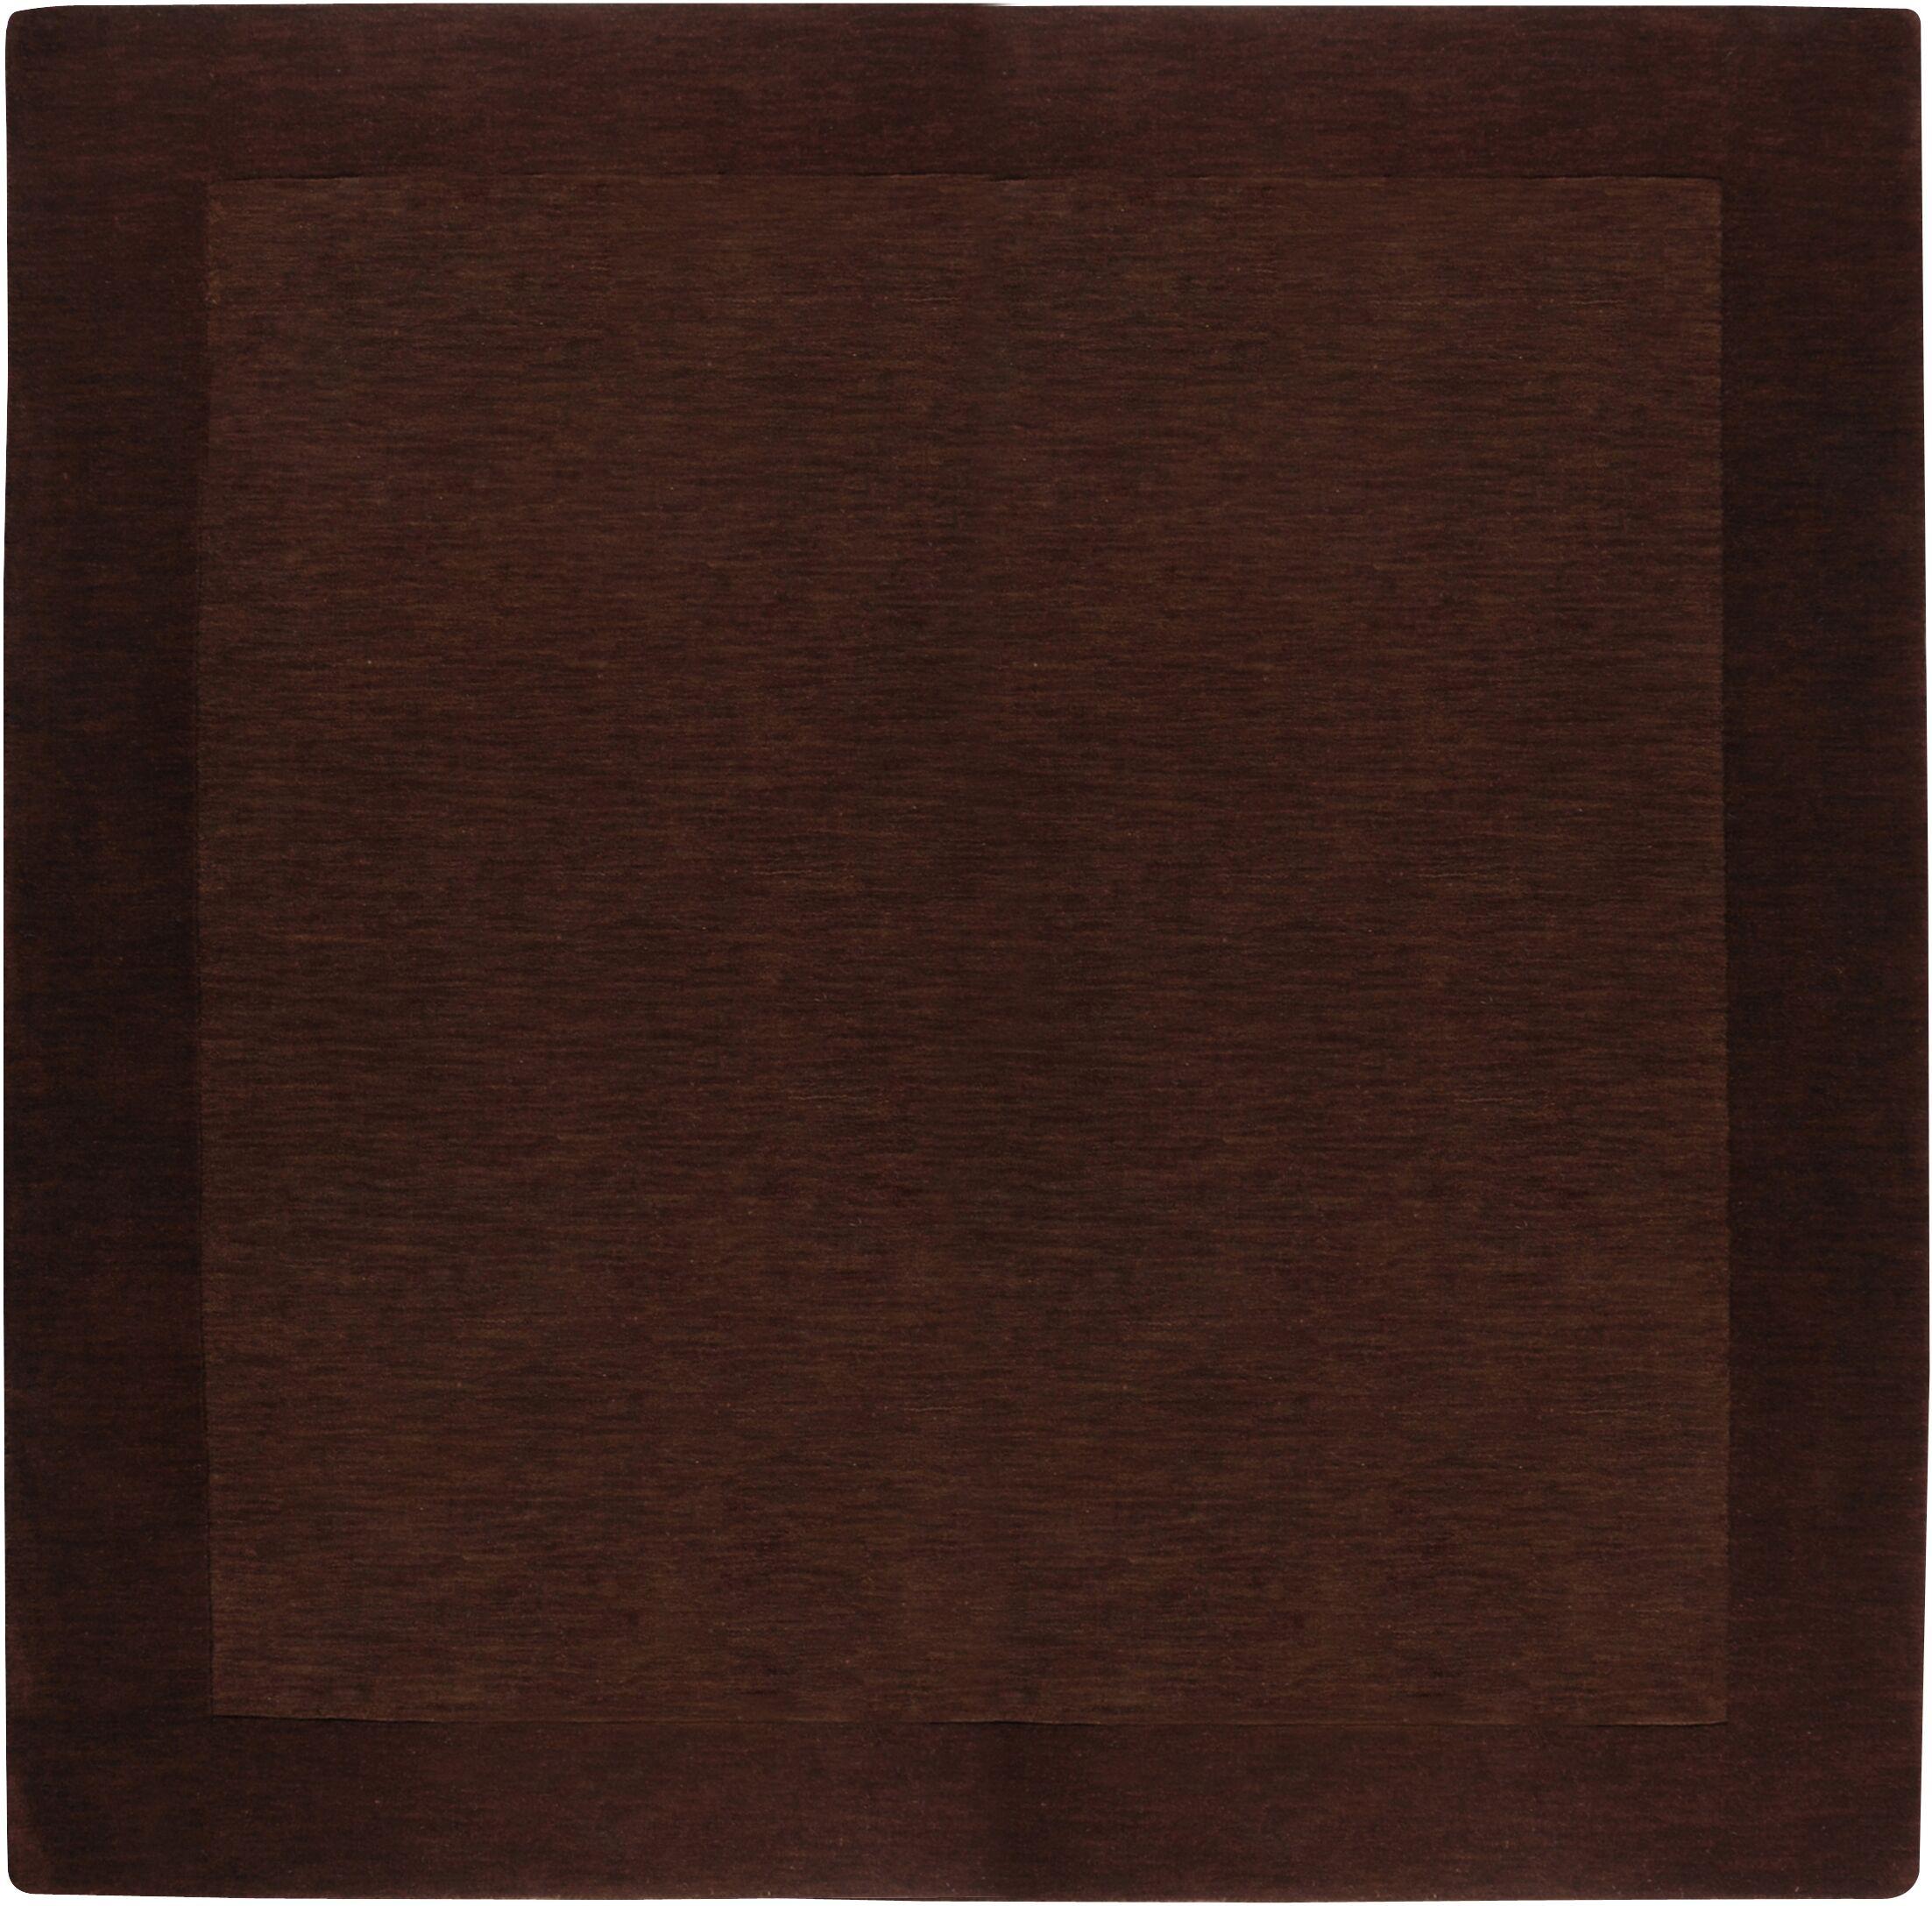 Bradley Chocolate Area Rug Rug Size: Square 9'9